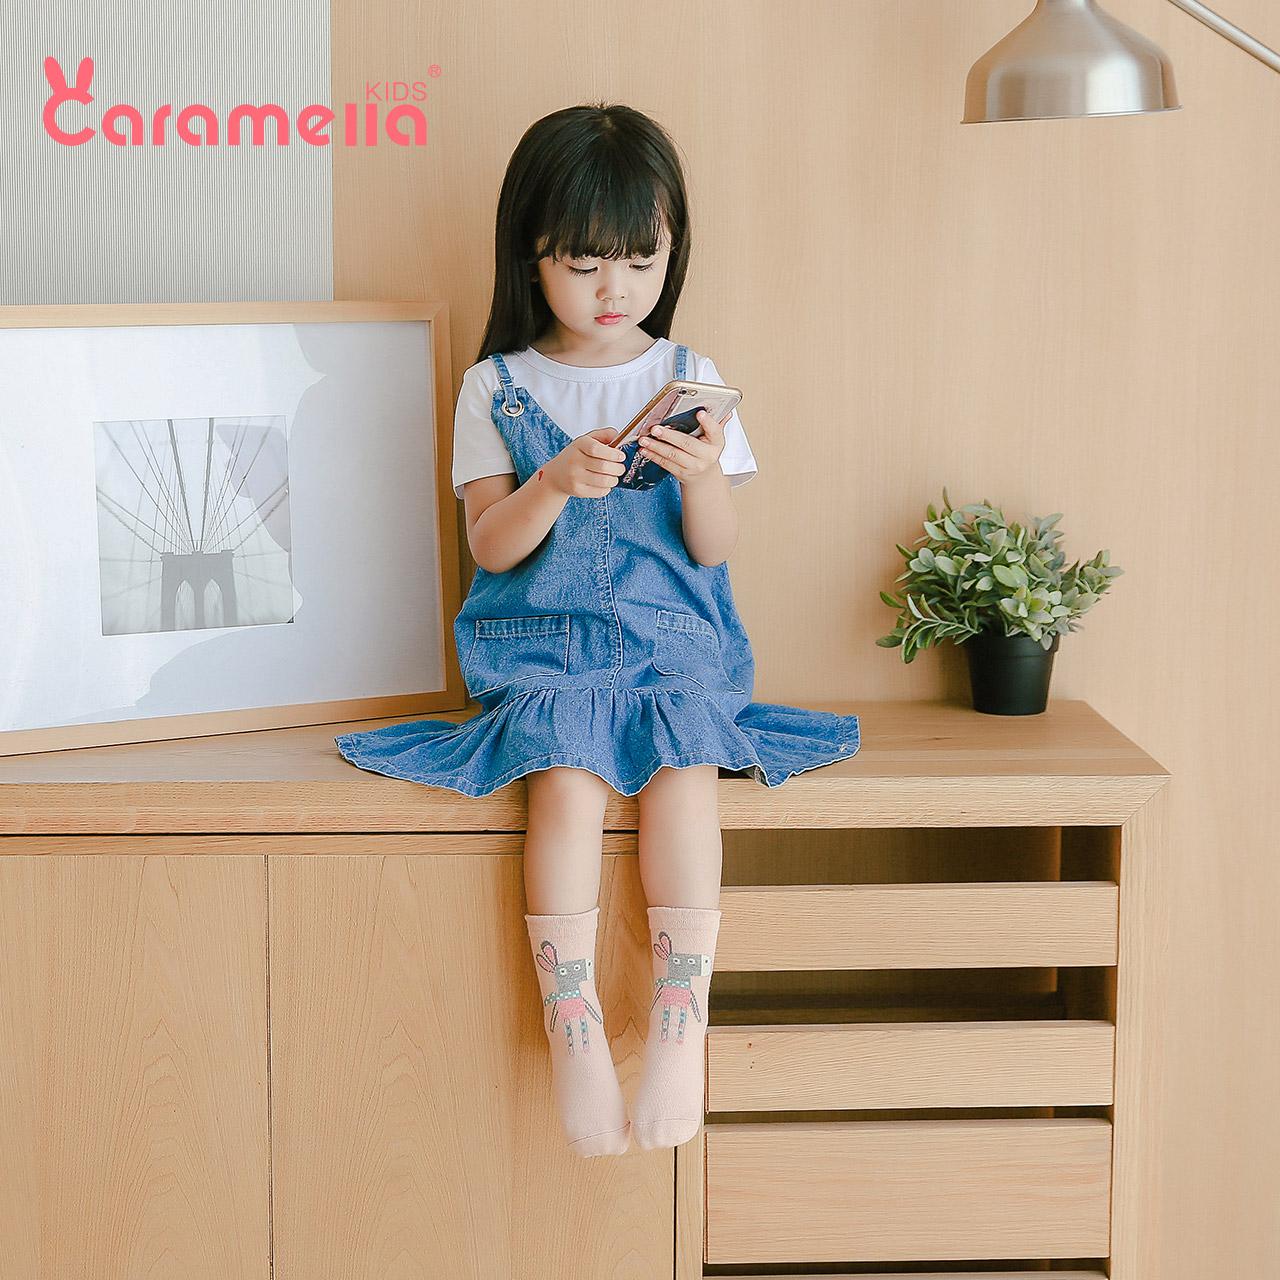 caramella秋冬婴儿袜子棉质男女童袜儿童中筒袜子地板袜宝宝袜子